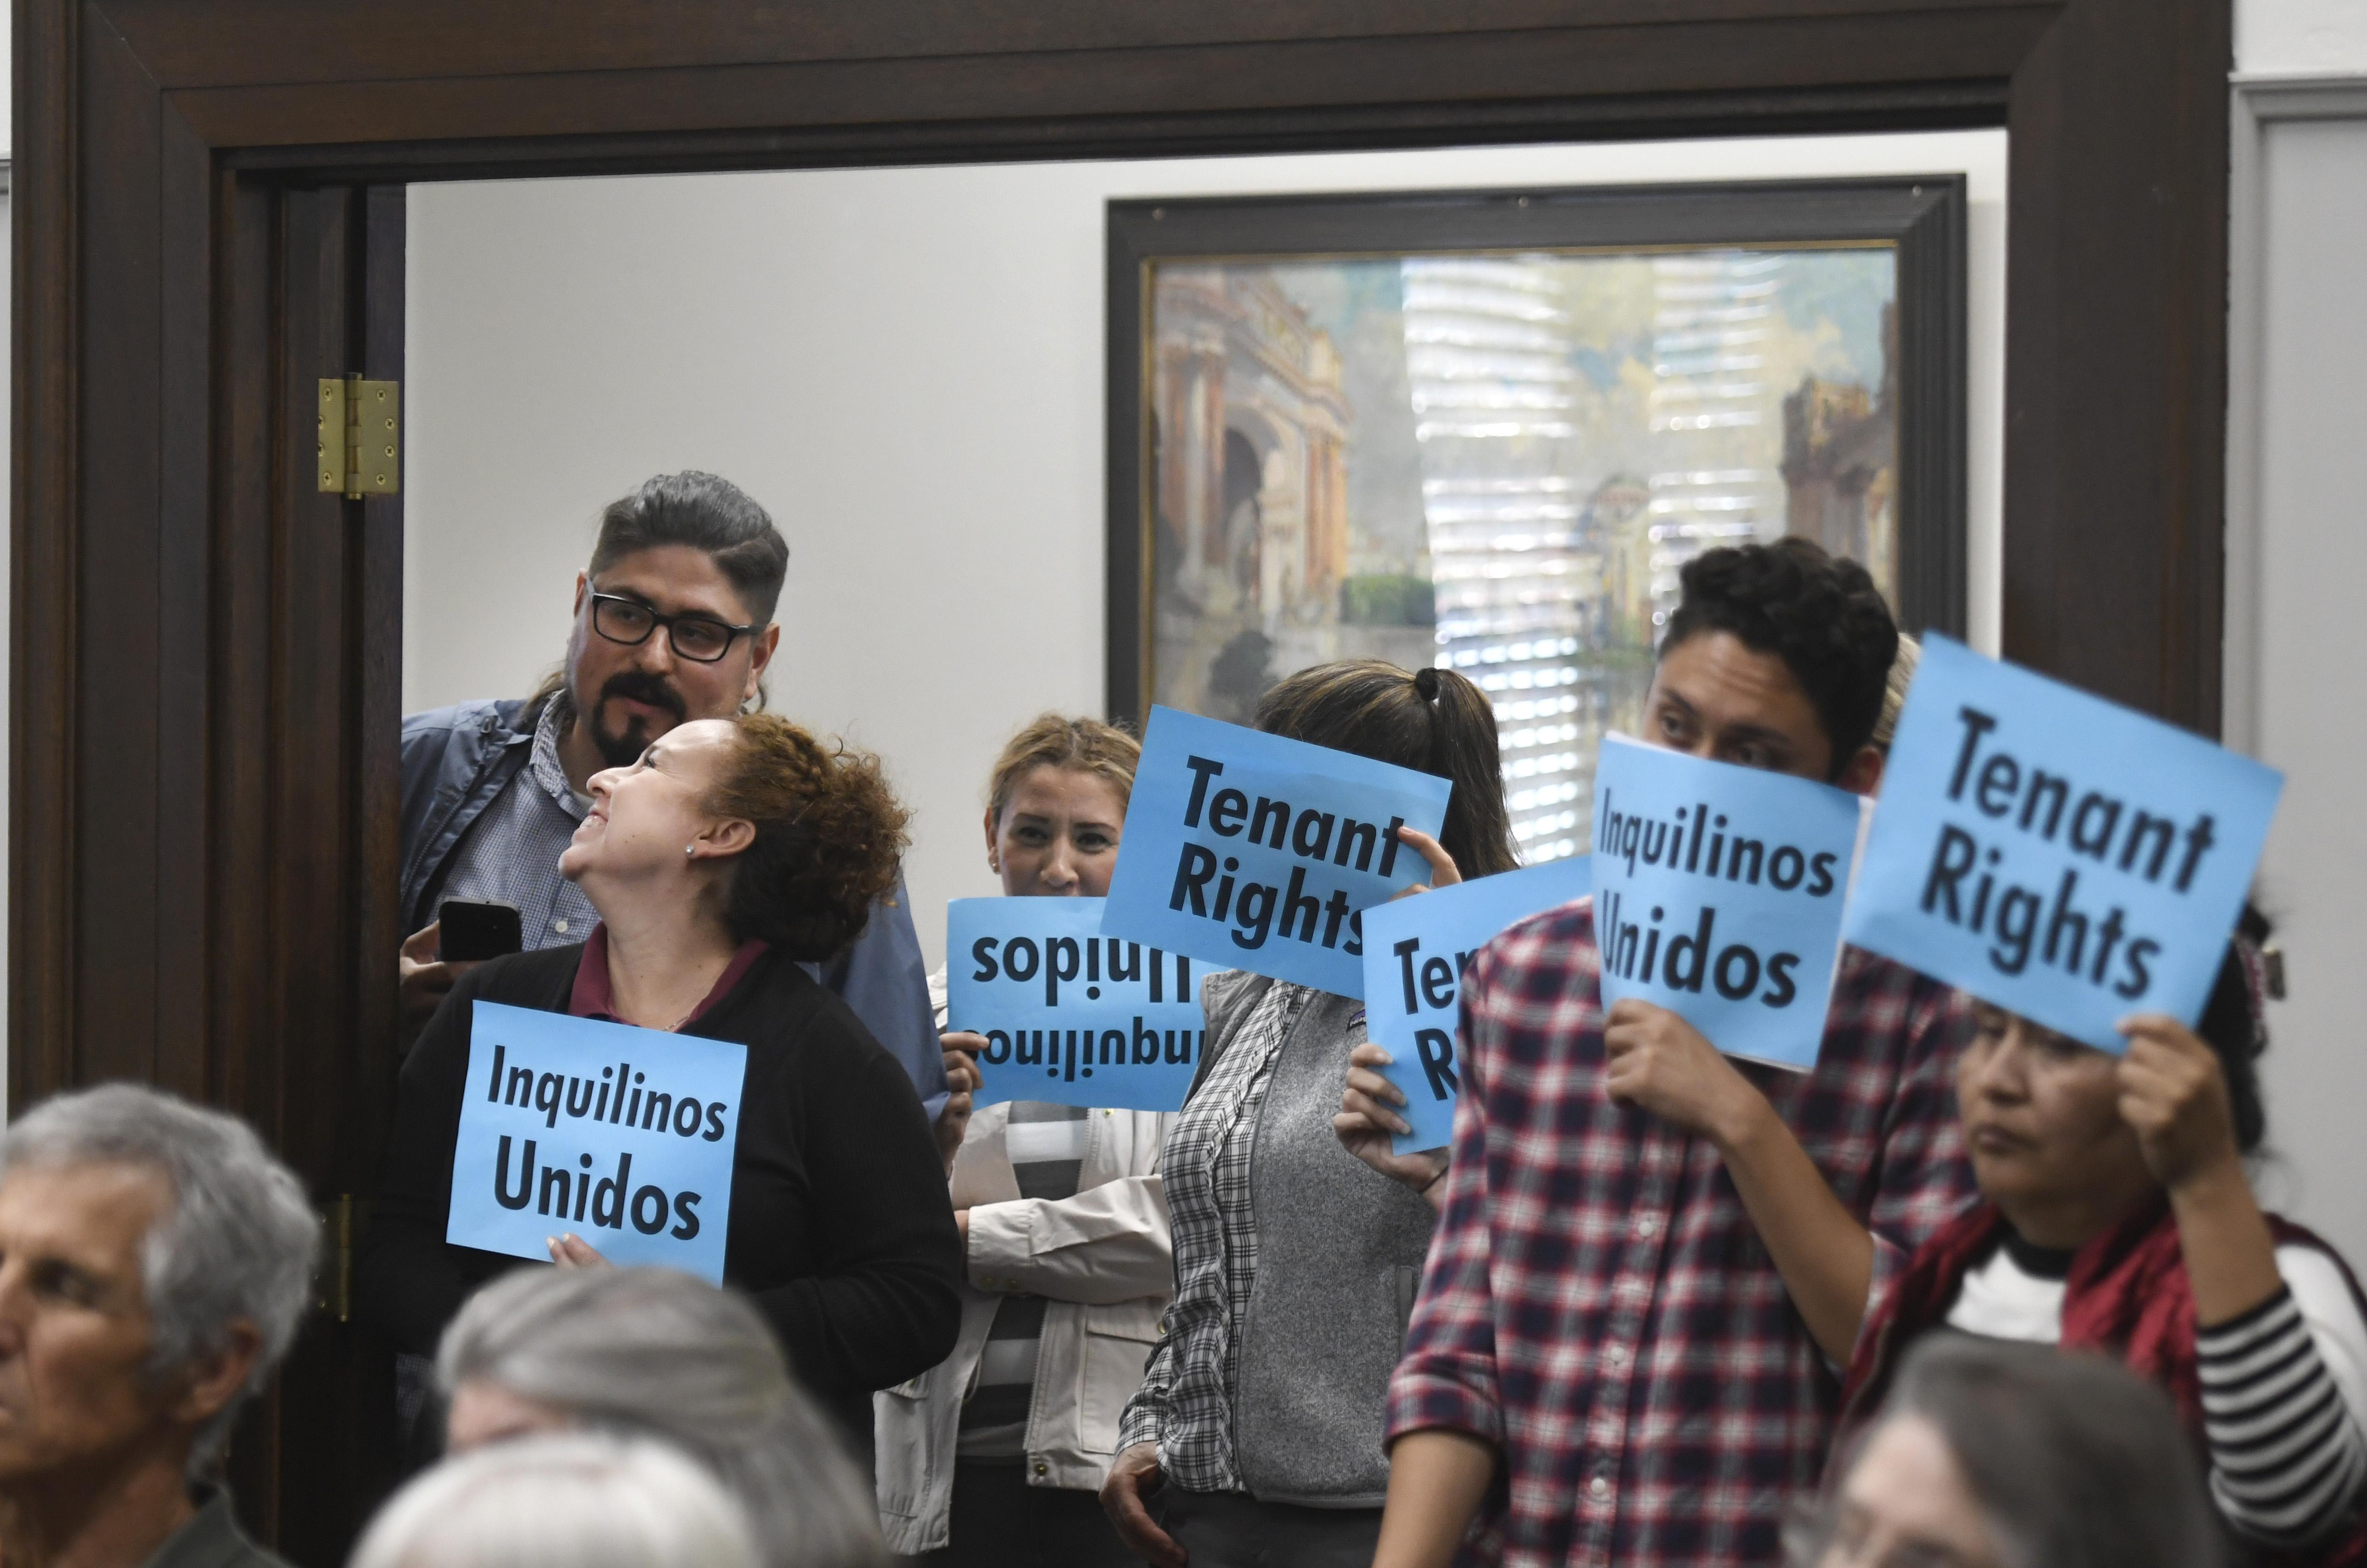 Just-Cause Eviction Protection Passes Council - The Santa Barbara